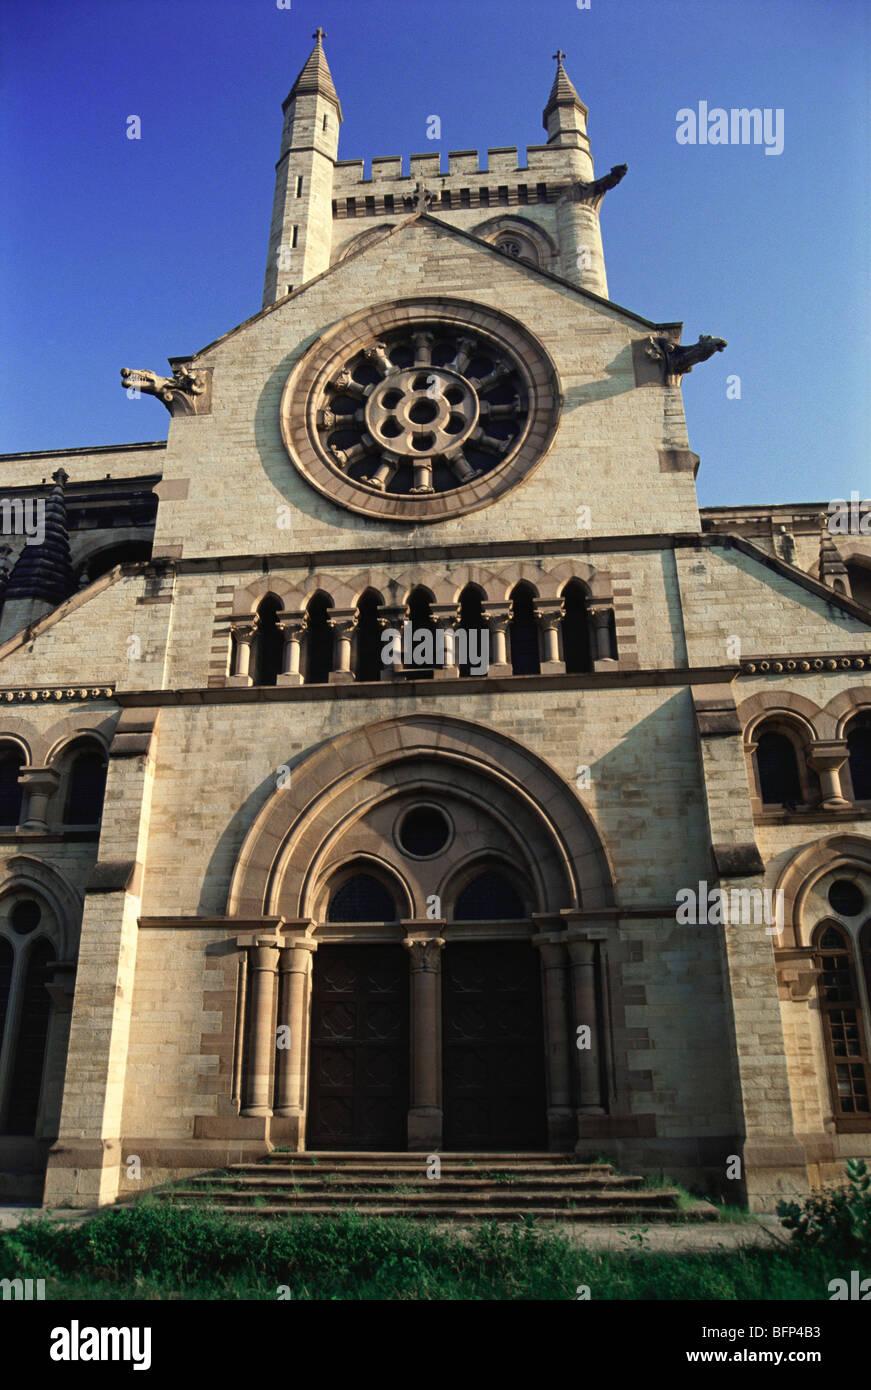 NGS 65822 : All Saints church ; Allahabad ; Uttar Pradesh ; India - Stock Image